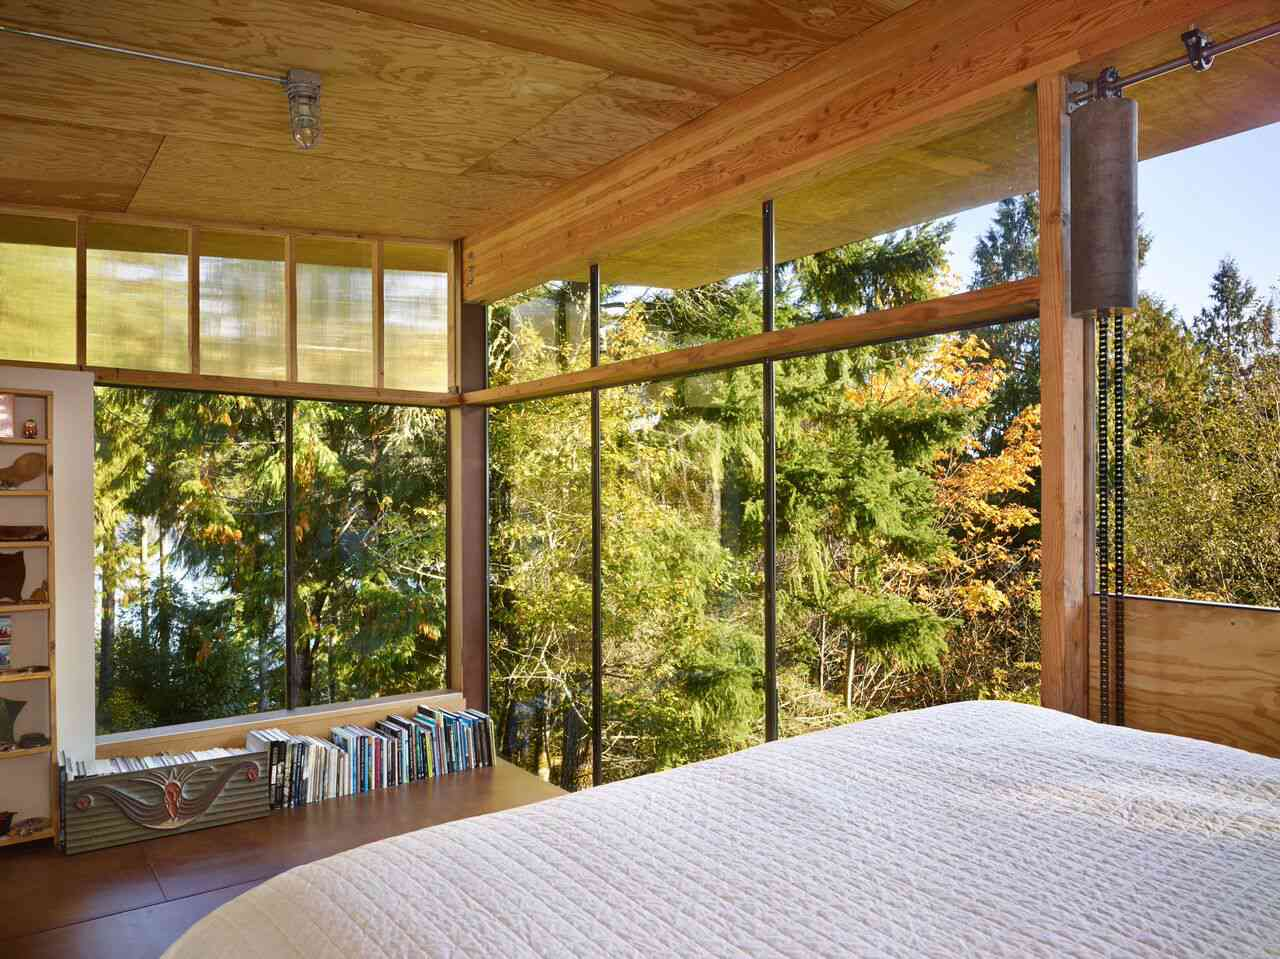 Sleeping loft at Scavenger Studio by Eerkes Architects, Grapeview, Washington